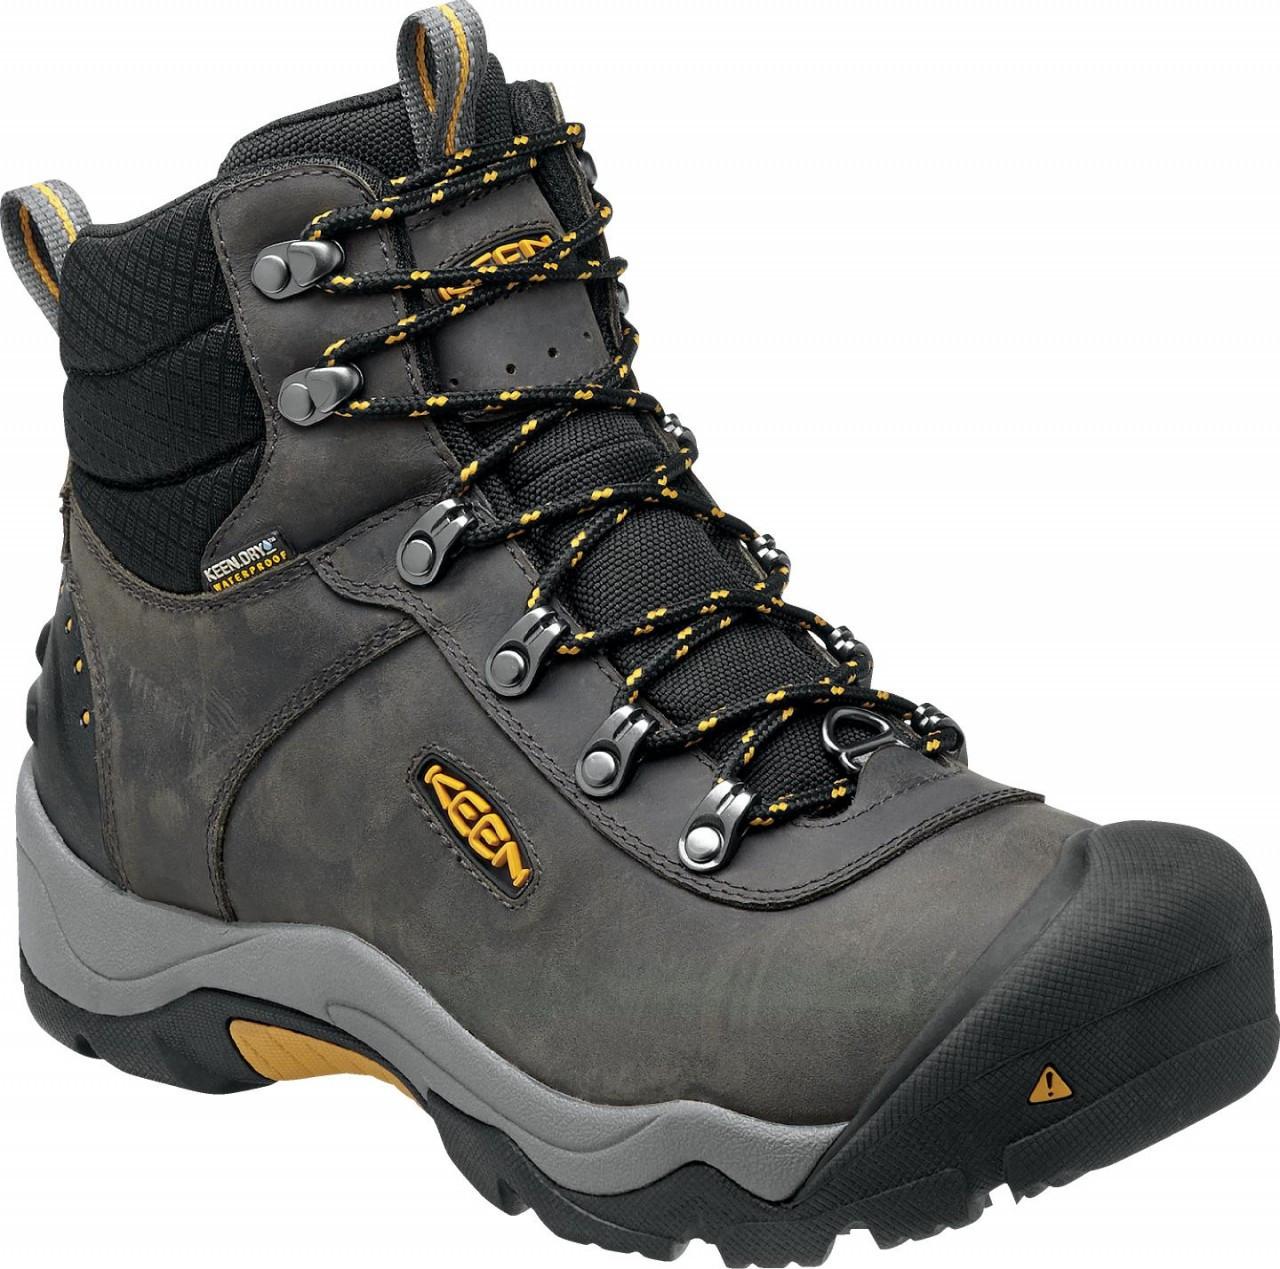 66ecb4d1465 Men's Keen Revel III Winter Hiking Boot